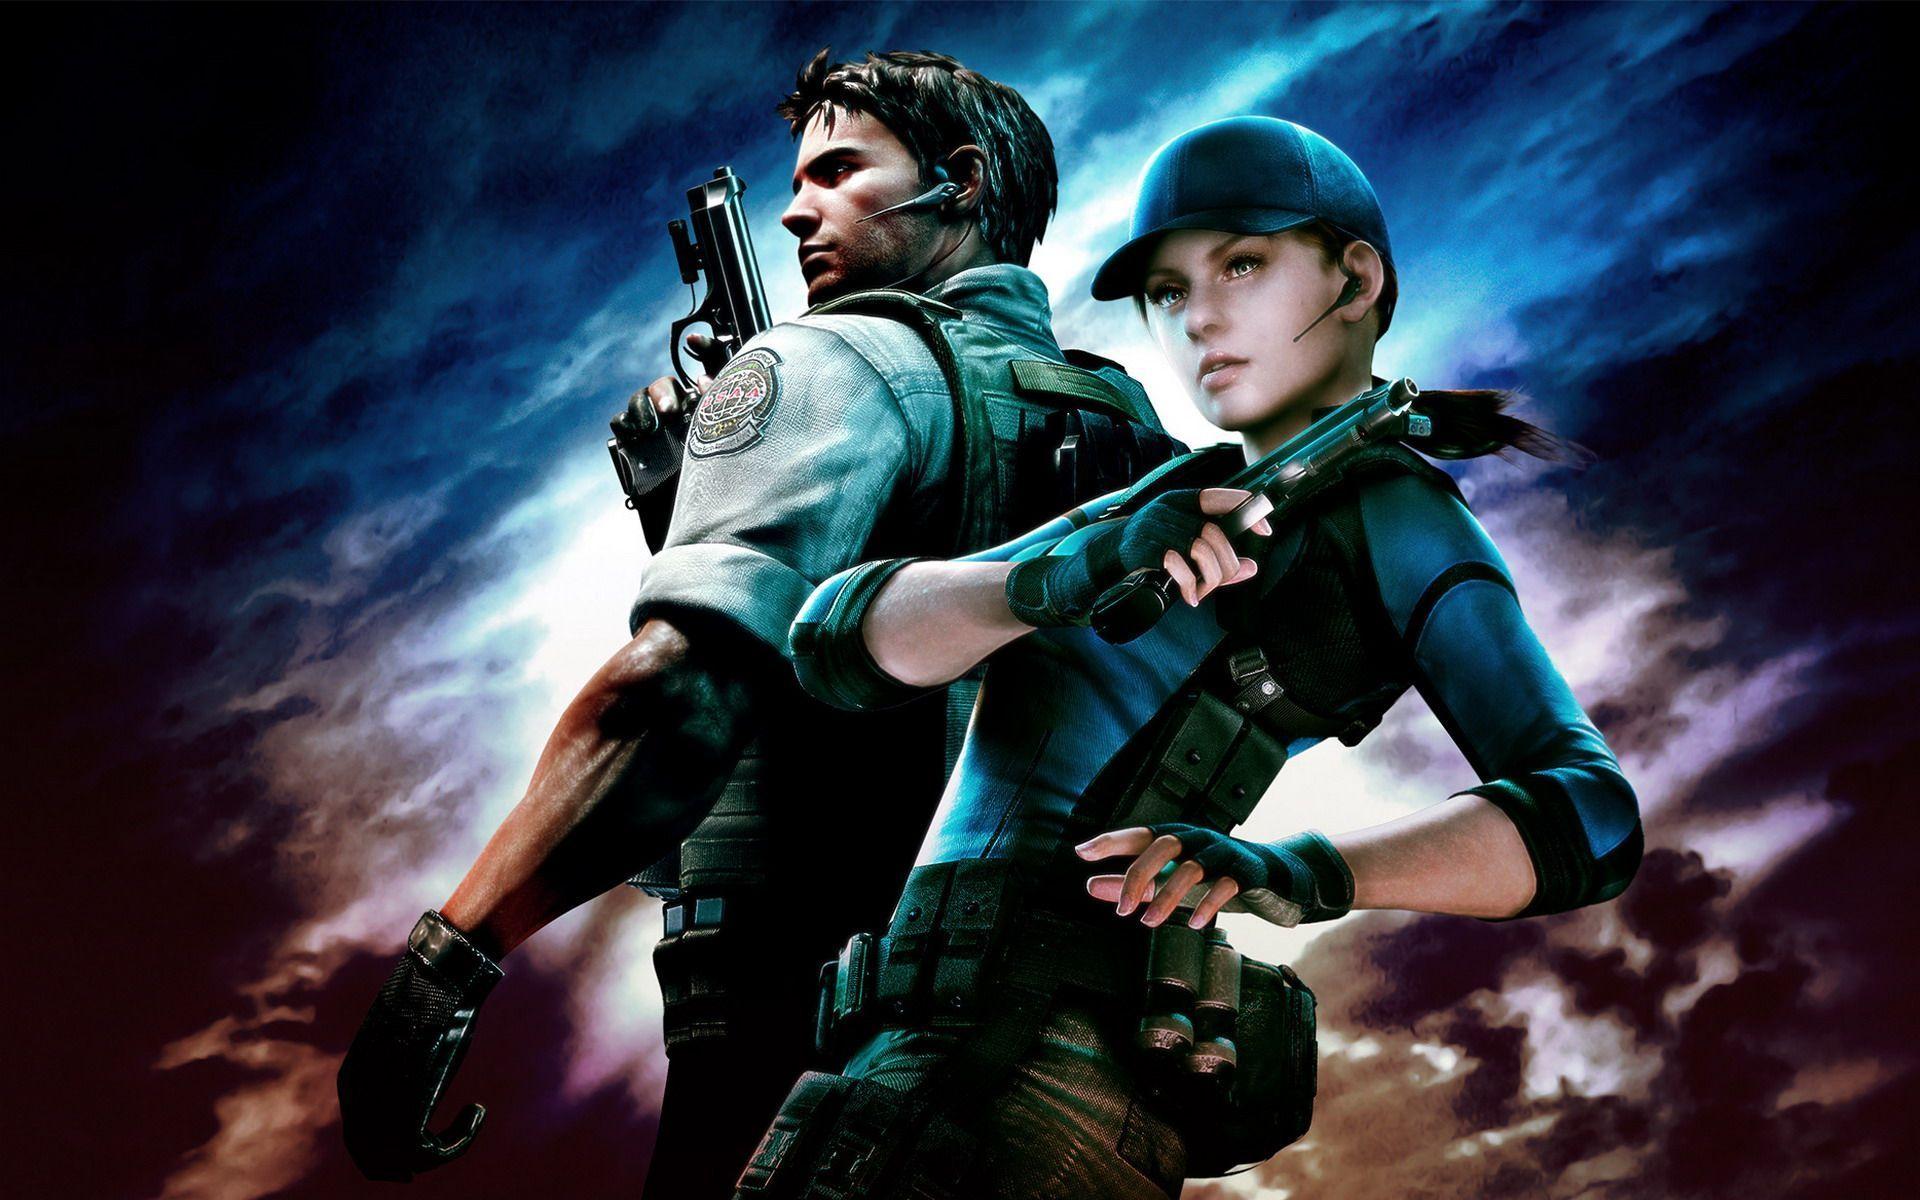 Resident Evil 5 Game Wallpapers Hd Wallpapers Resident Evil